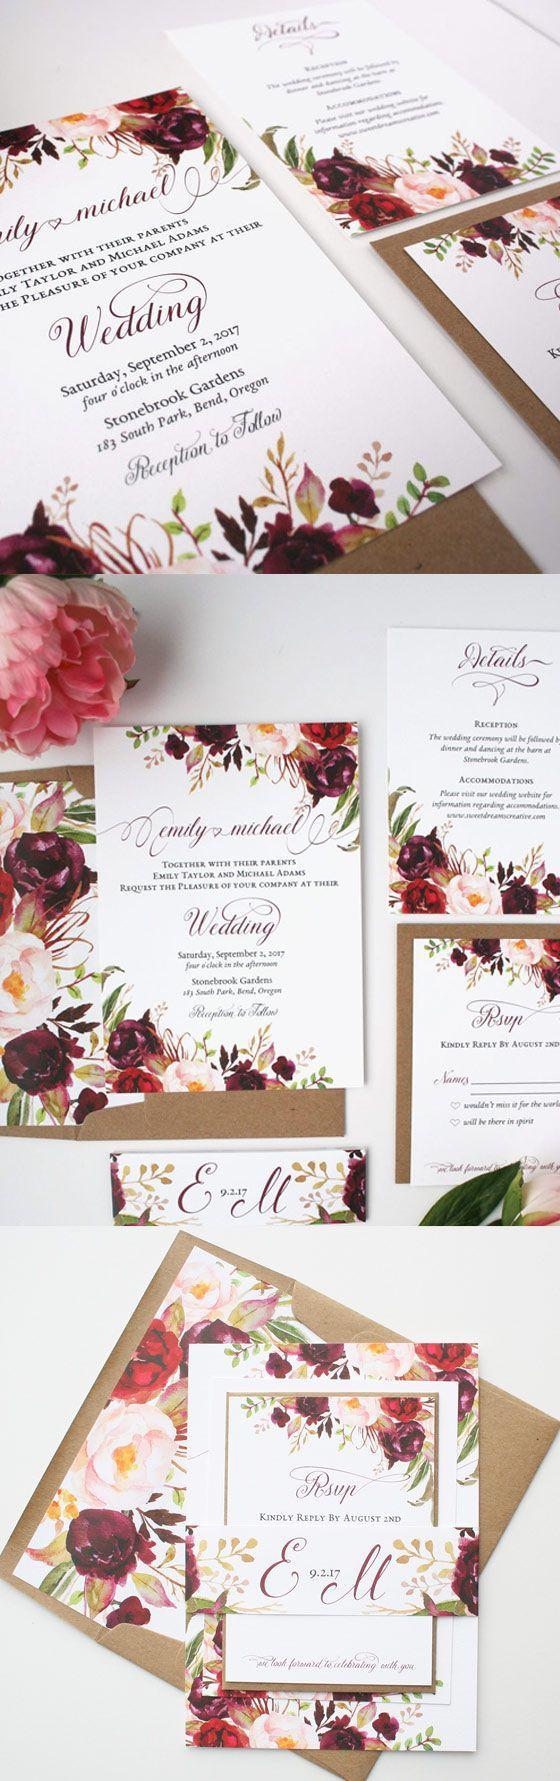 Love these burgundy & blush wedding invitations!